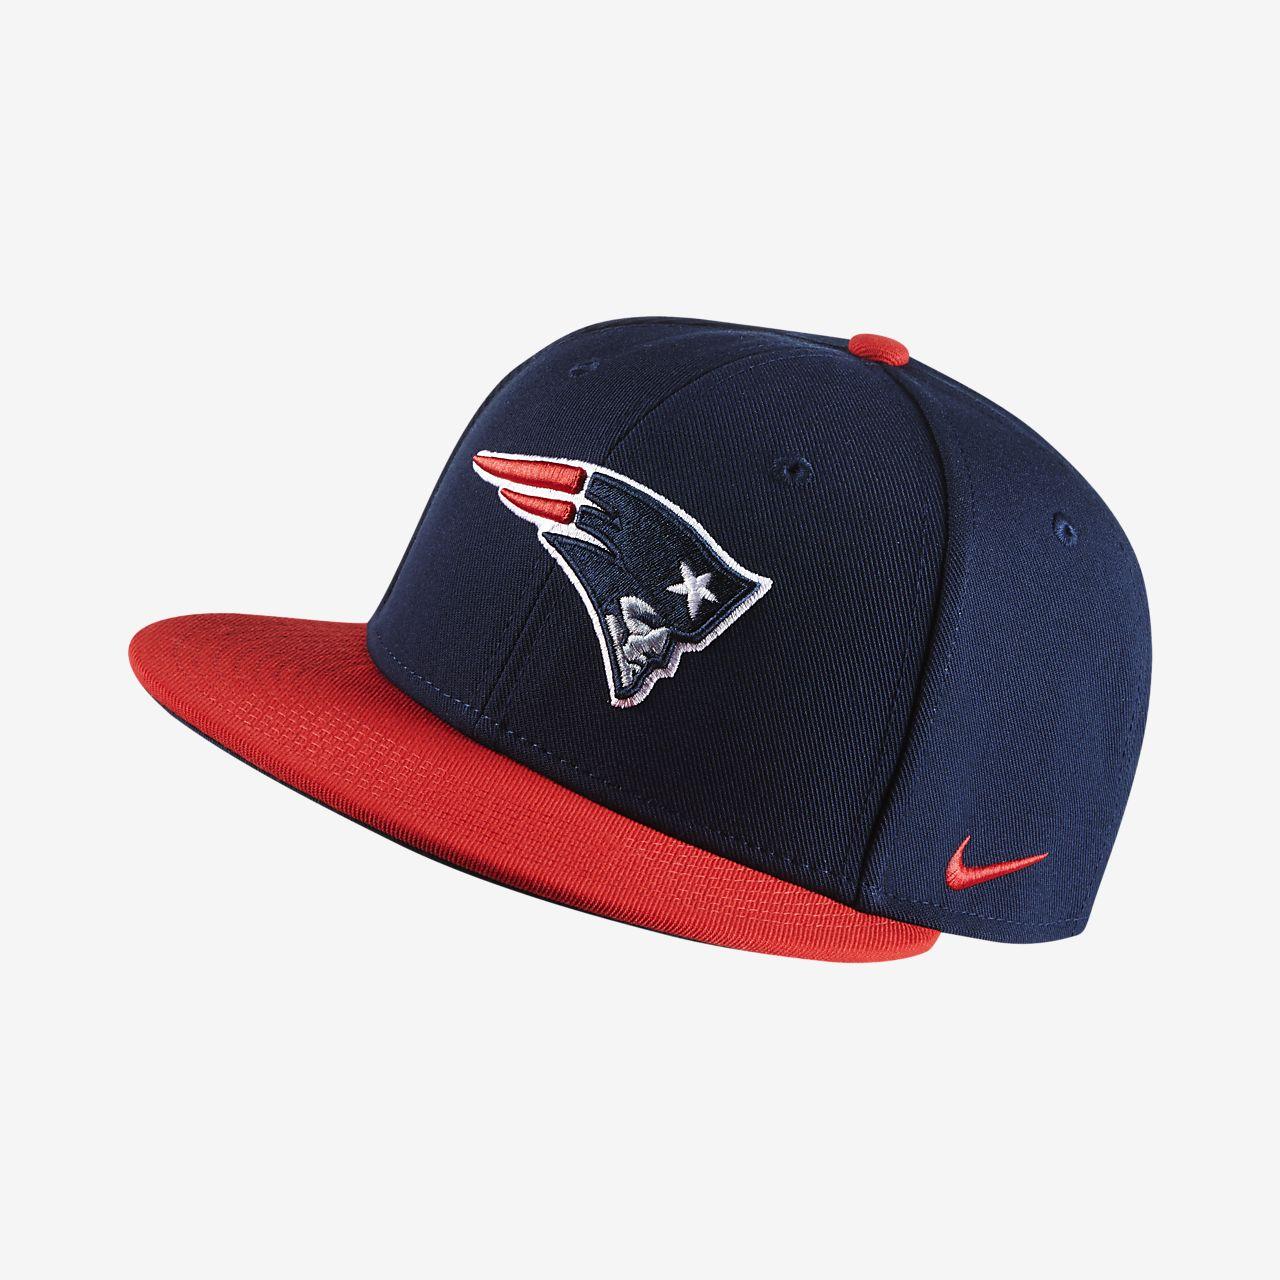 f09b679a1cc77 Gorro ajustable Nike Everyday True (NFL Patriots). Nike.com MX